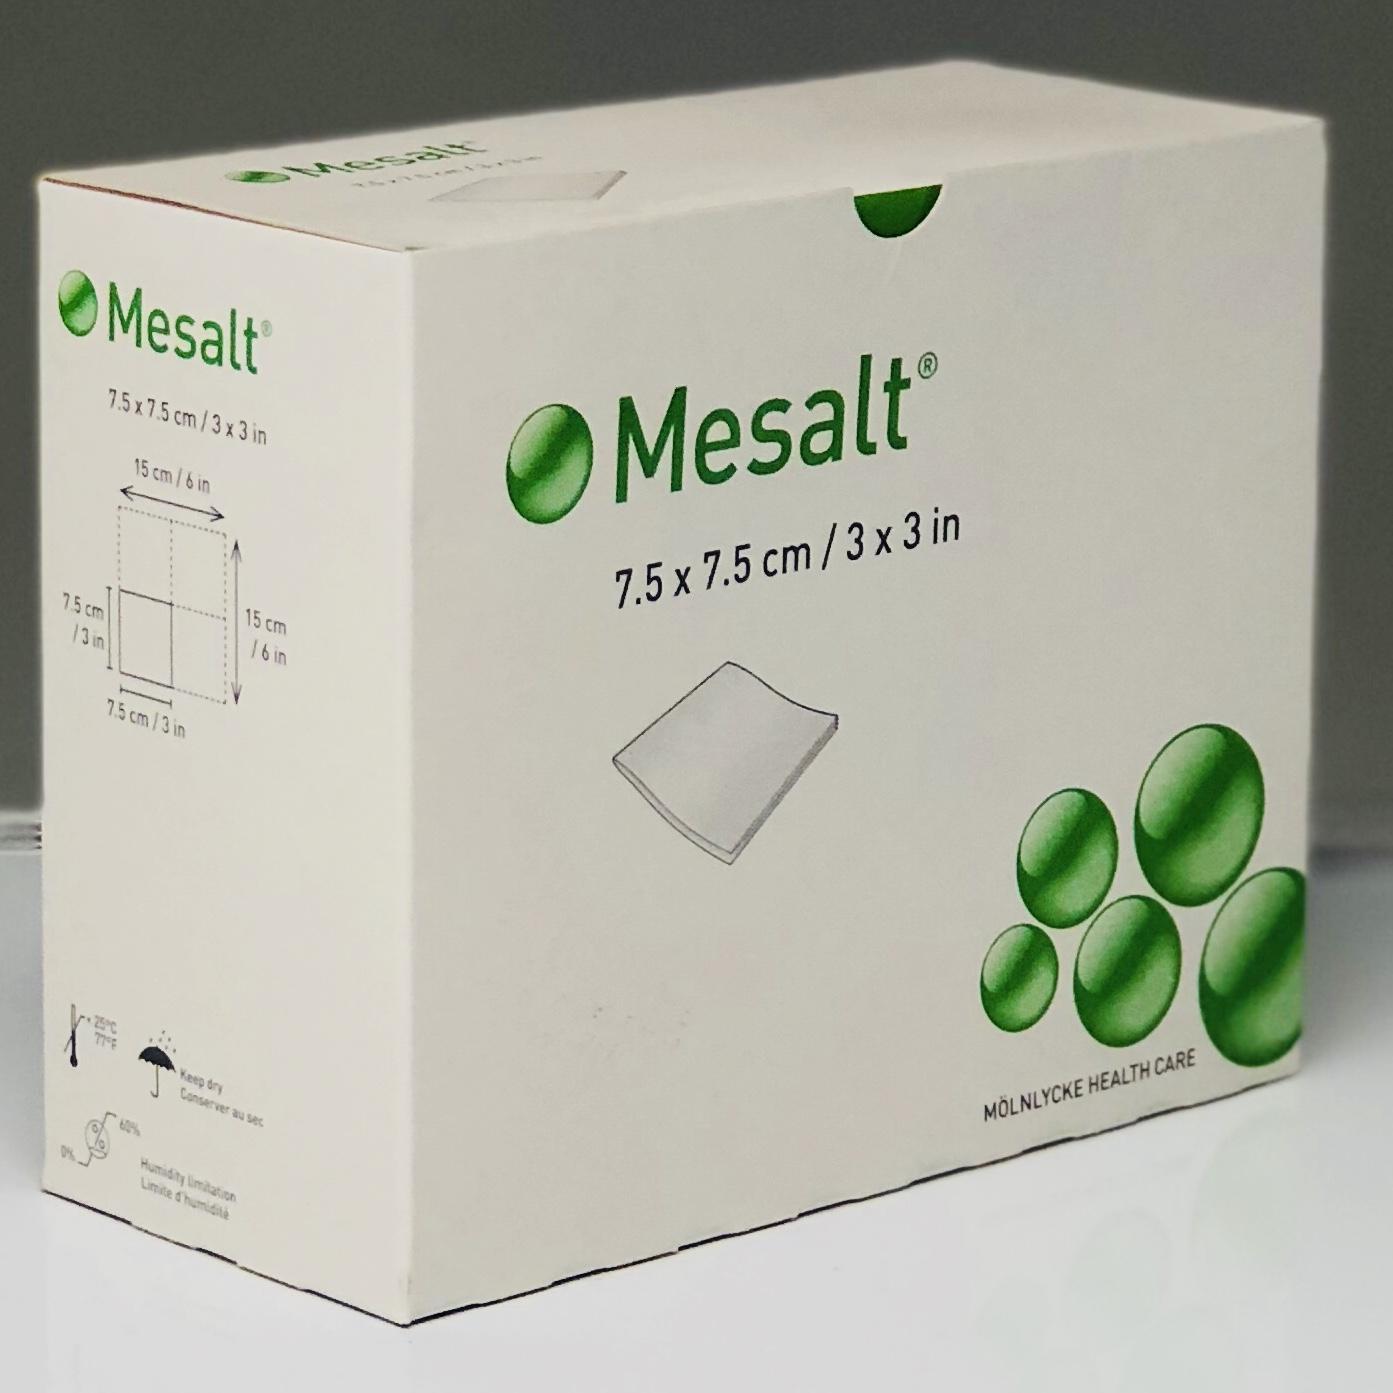 MESALT 7.5CMx7.5CM, BOX 30